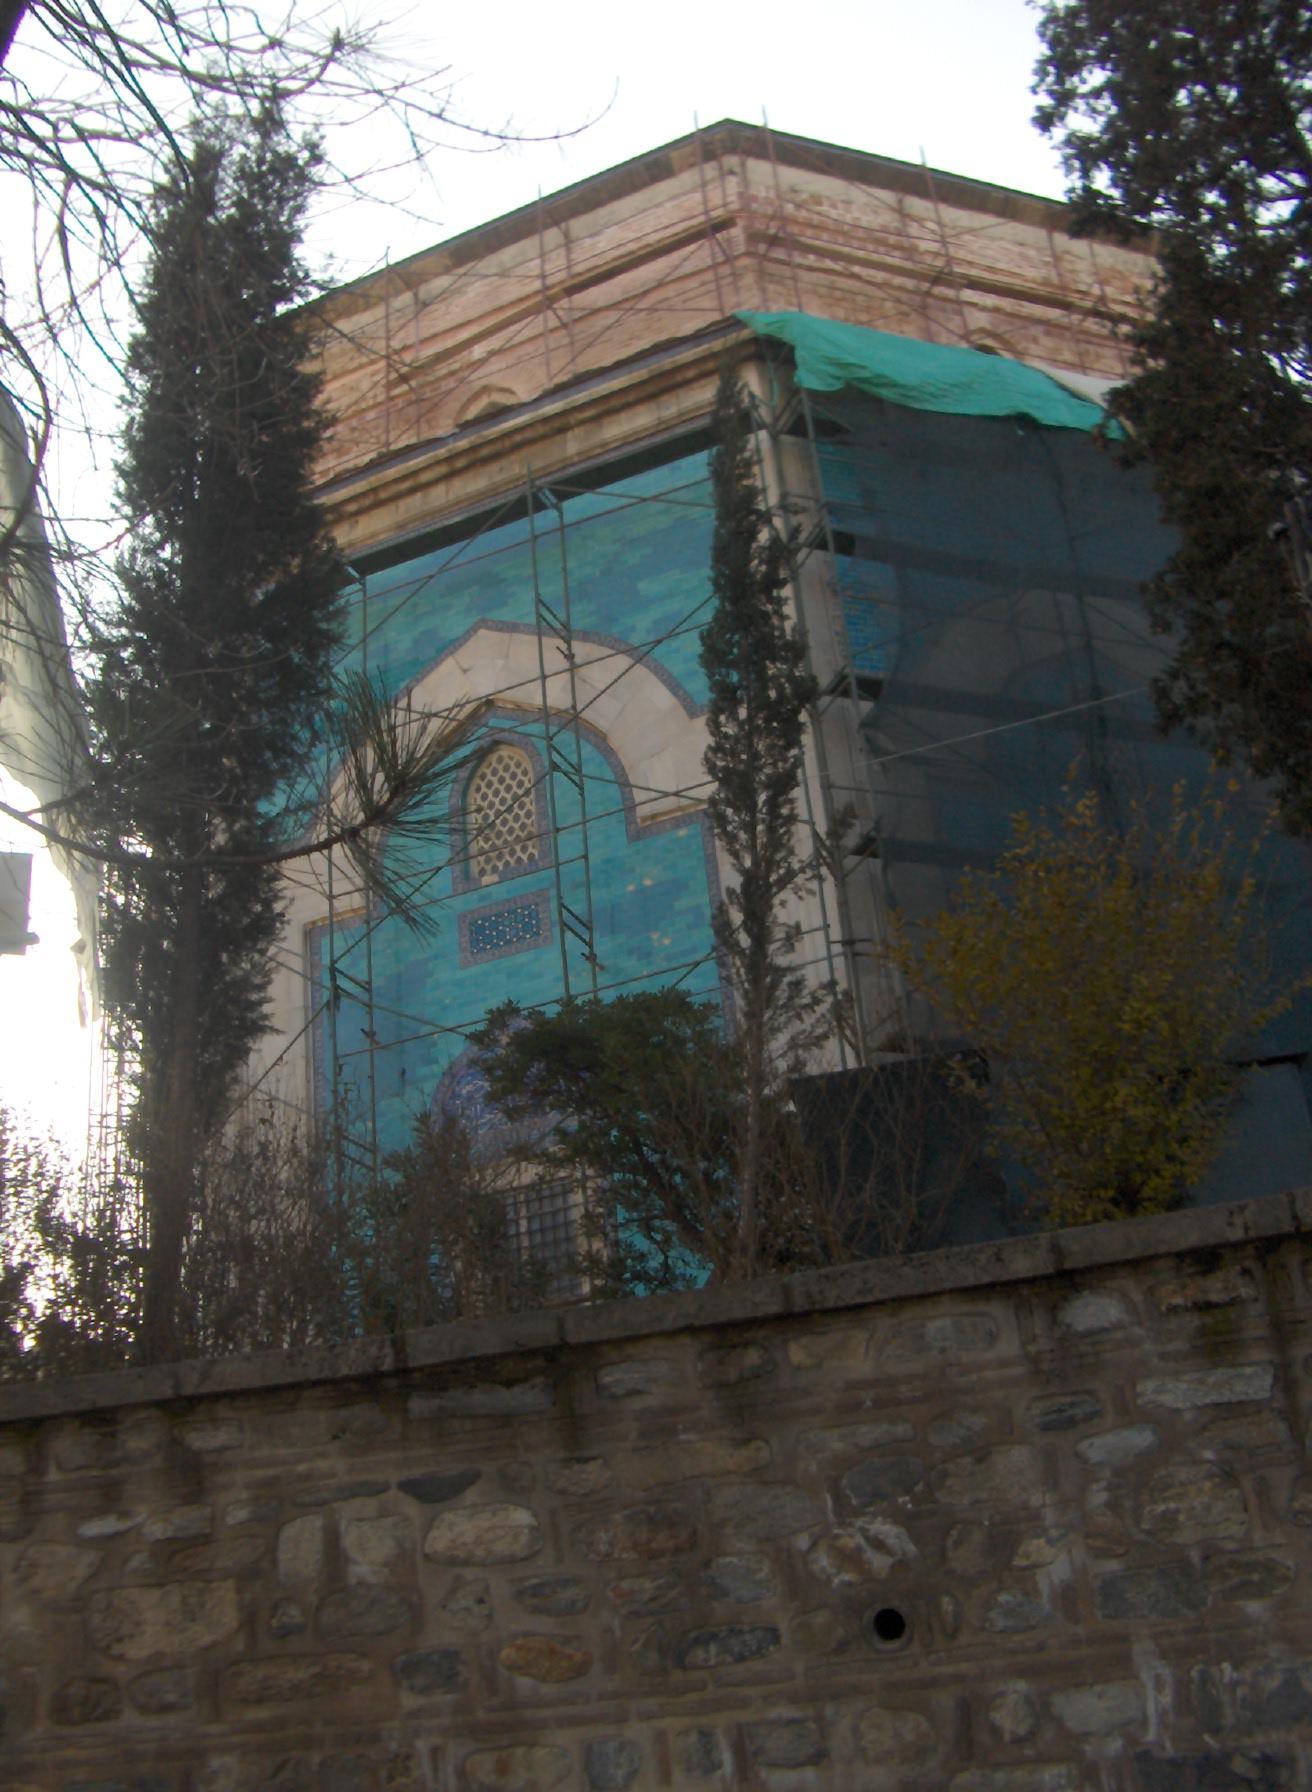 Yesil Turbe Restorasyonda